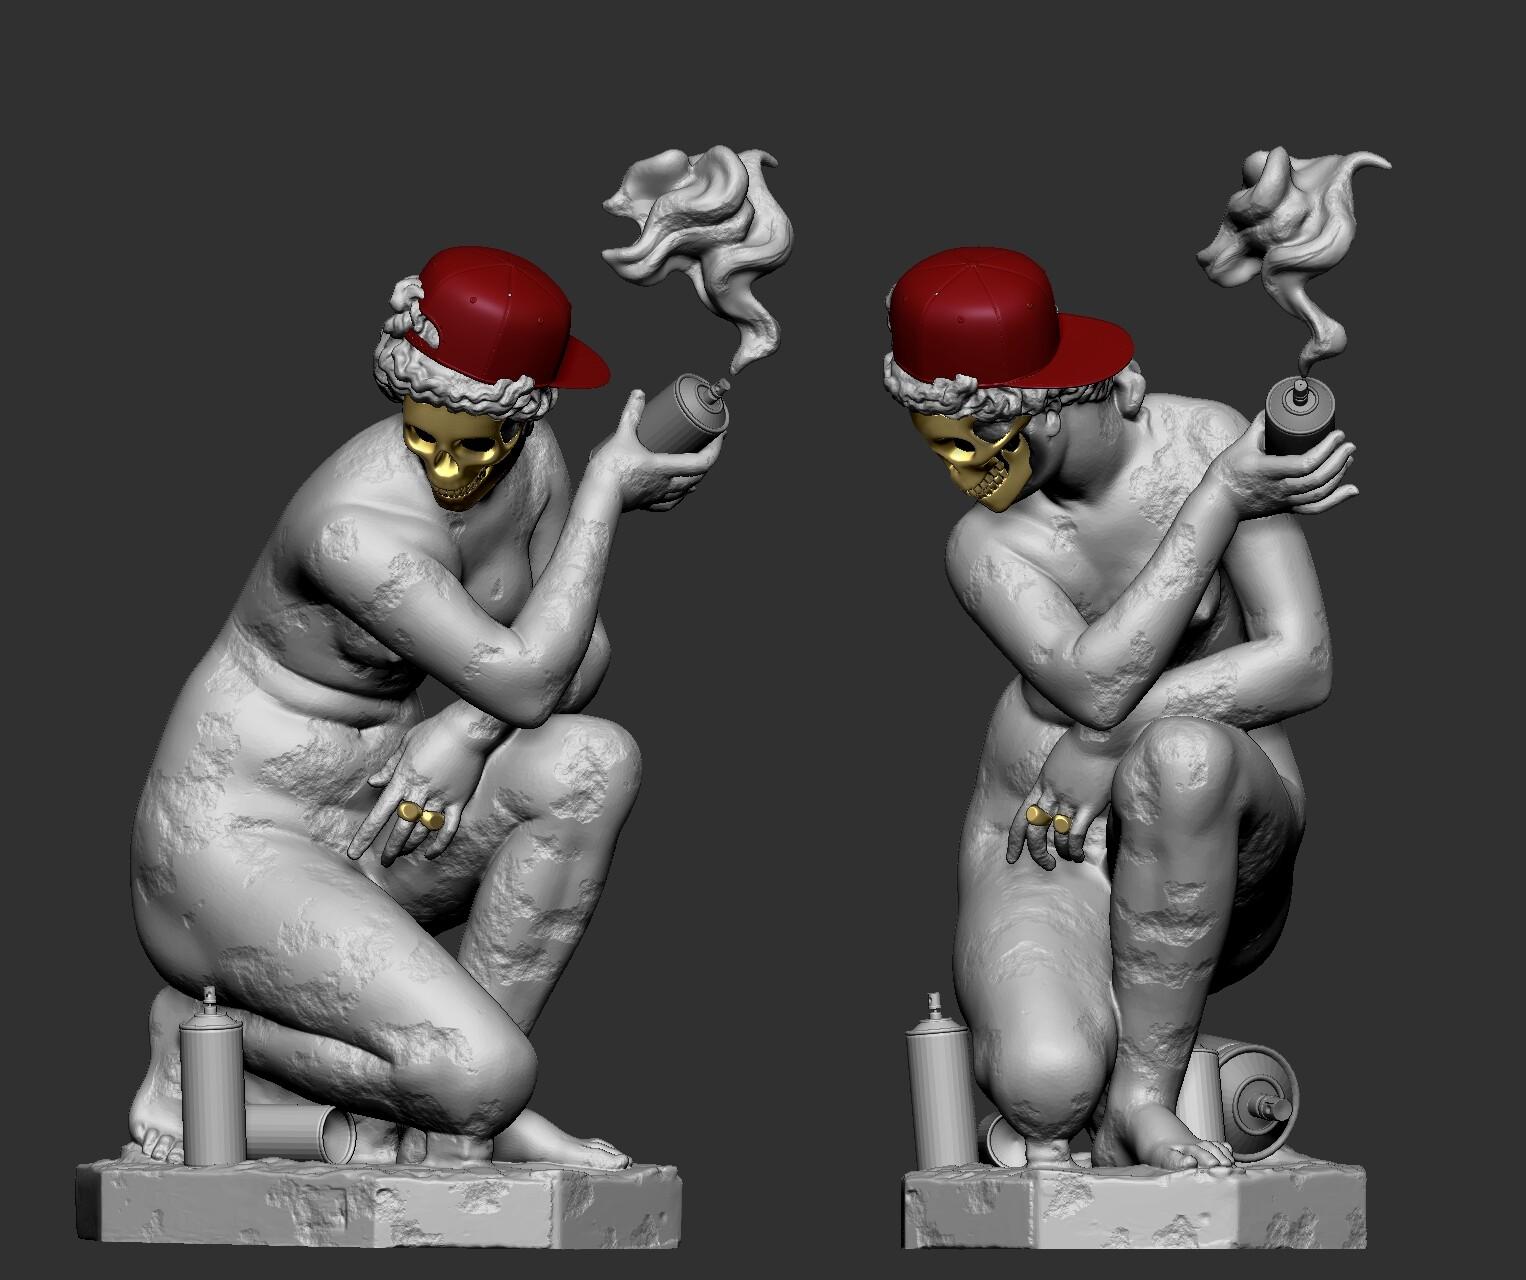 Bling bling greek gods series:the crouching venus revisited